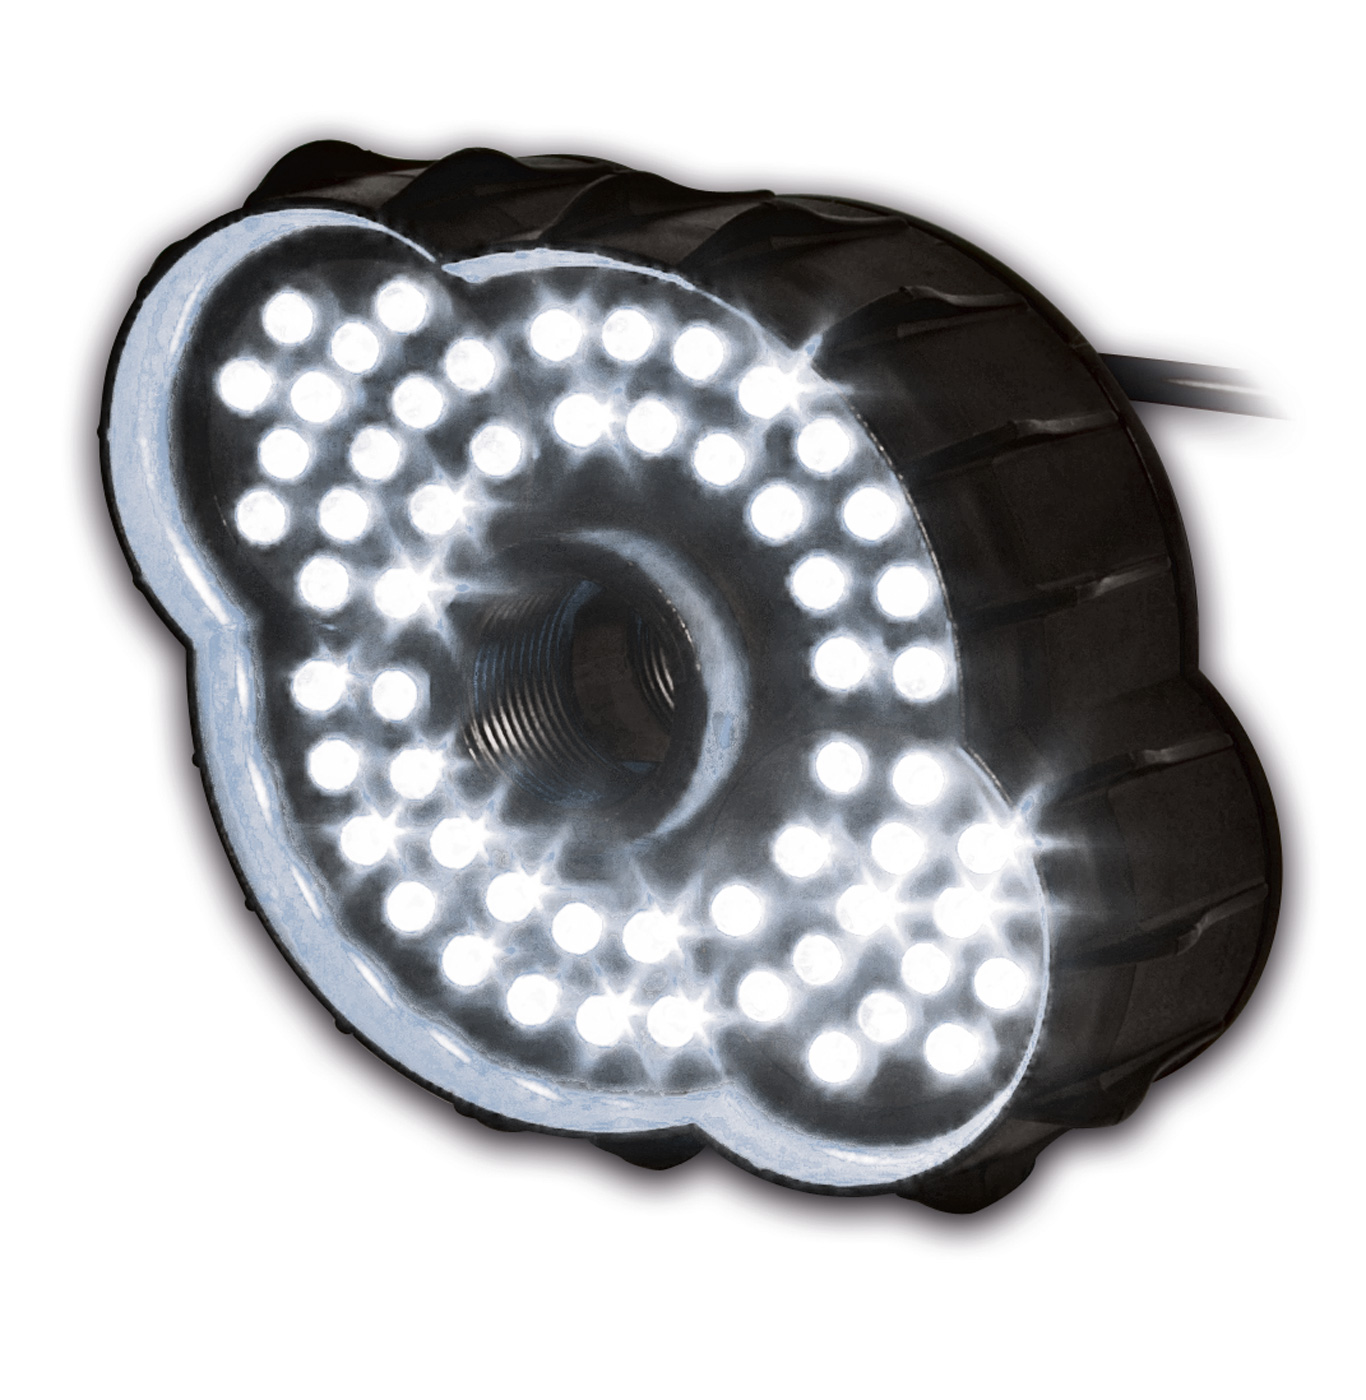 Fontänenbeleuchtung LEDPond P-58 (58LEDs/12V), weiß